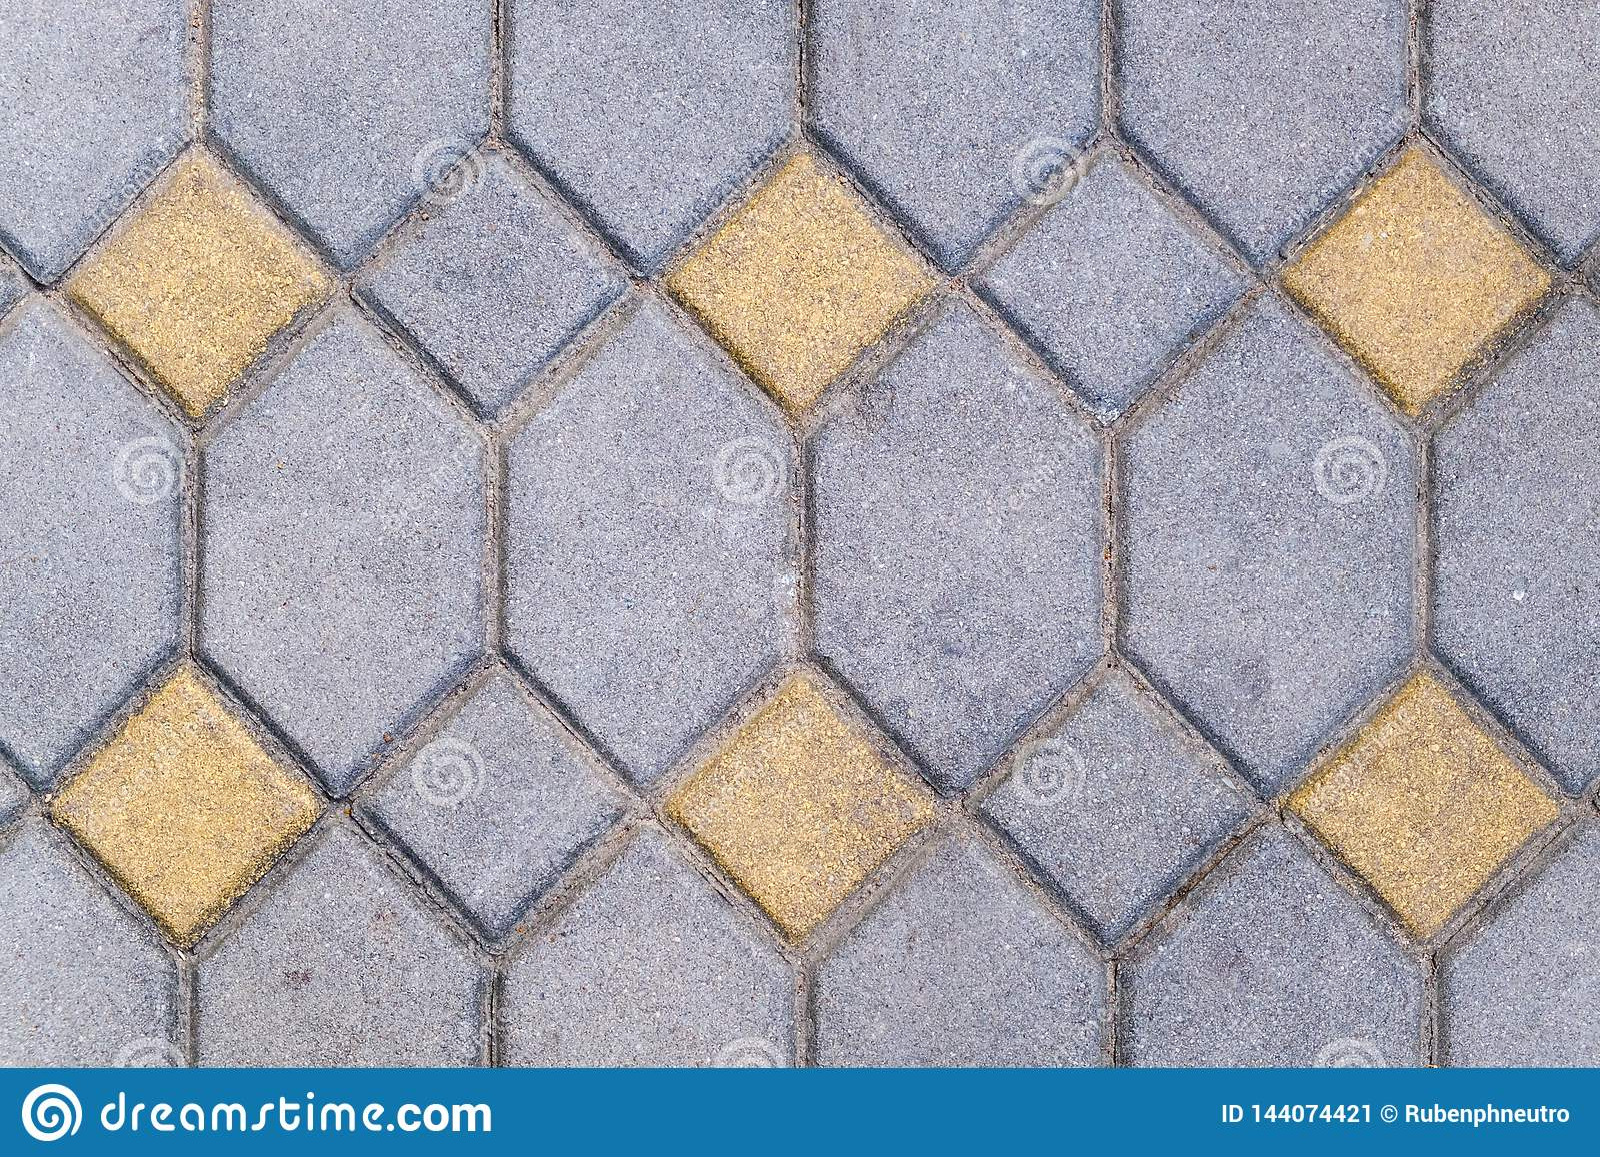 Texture of brick stone pattern floor close up